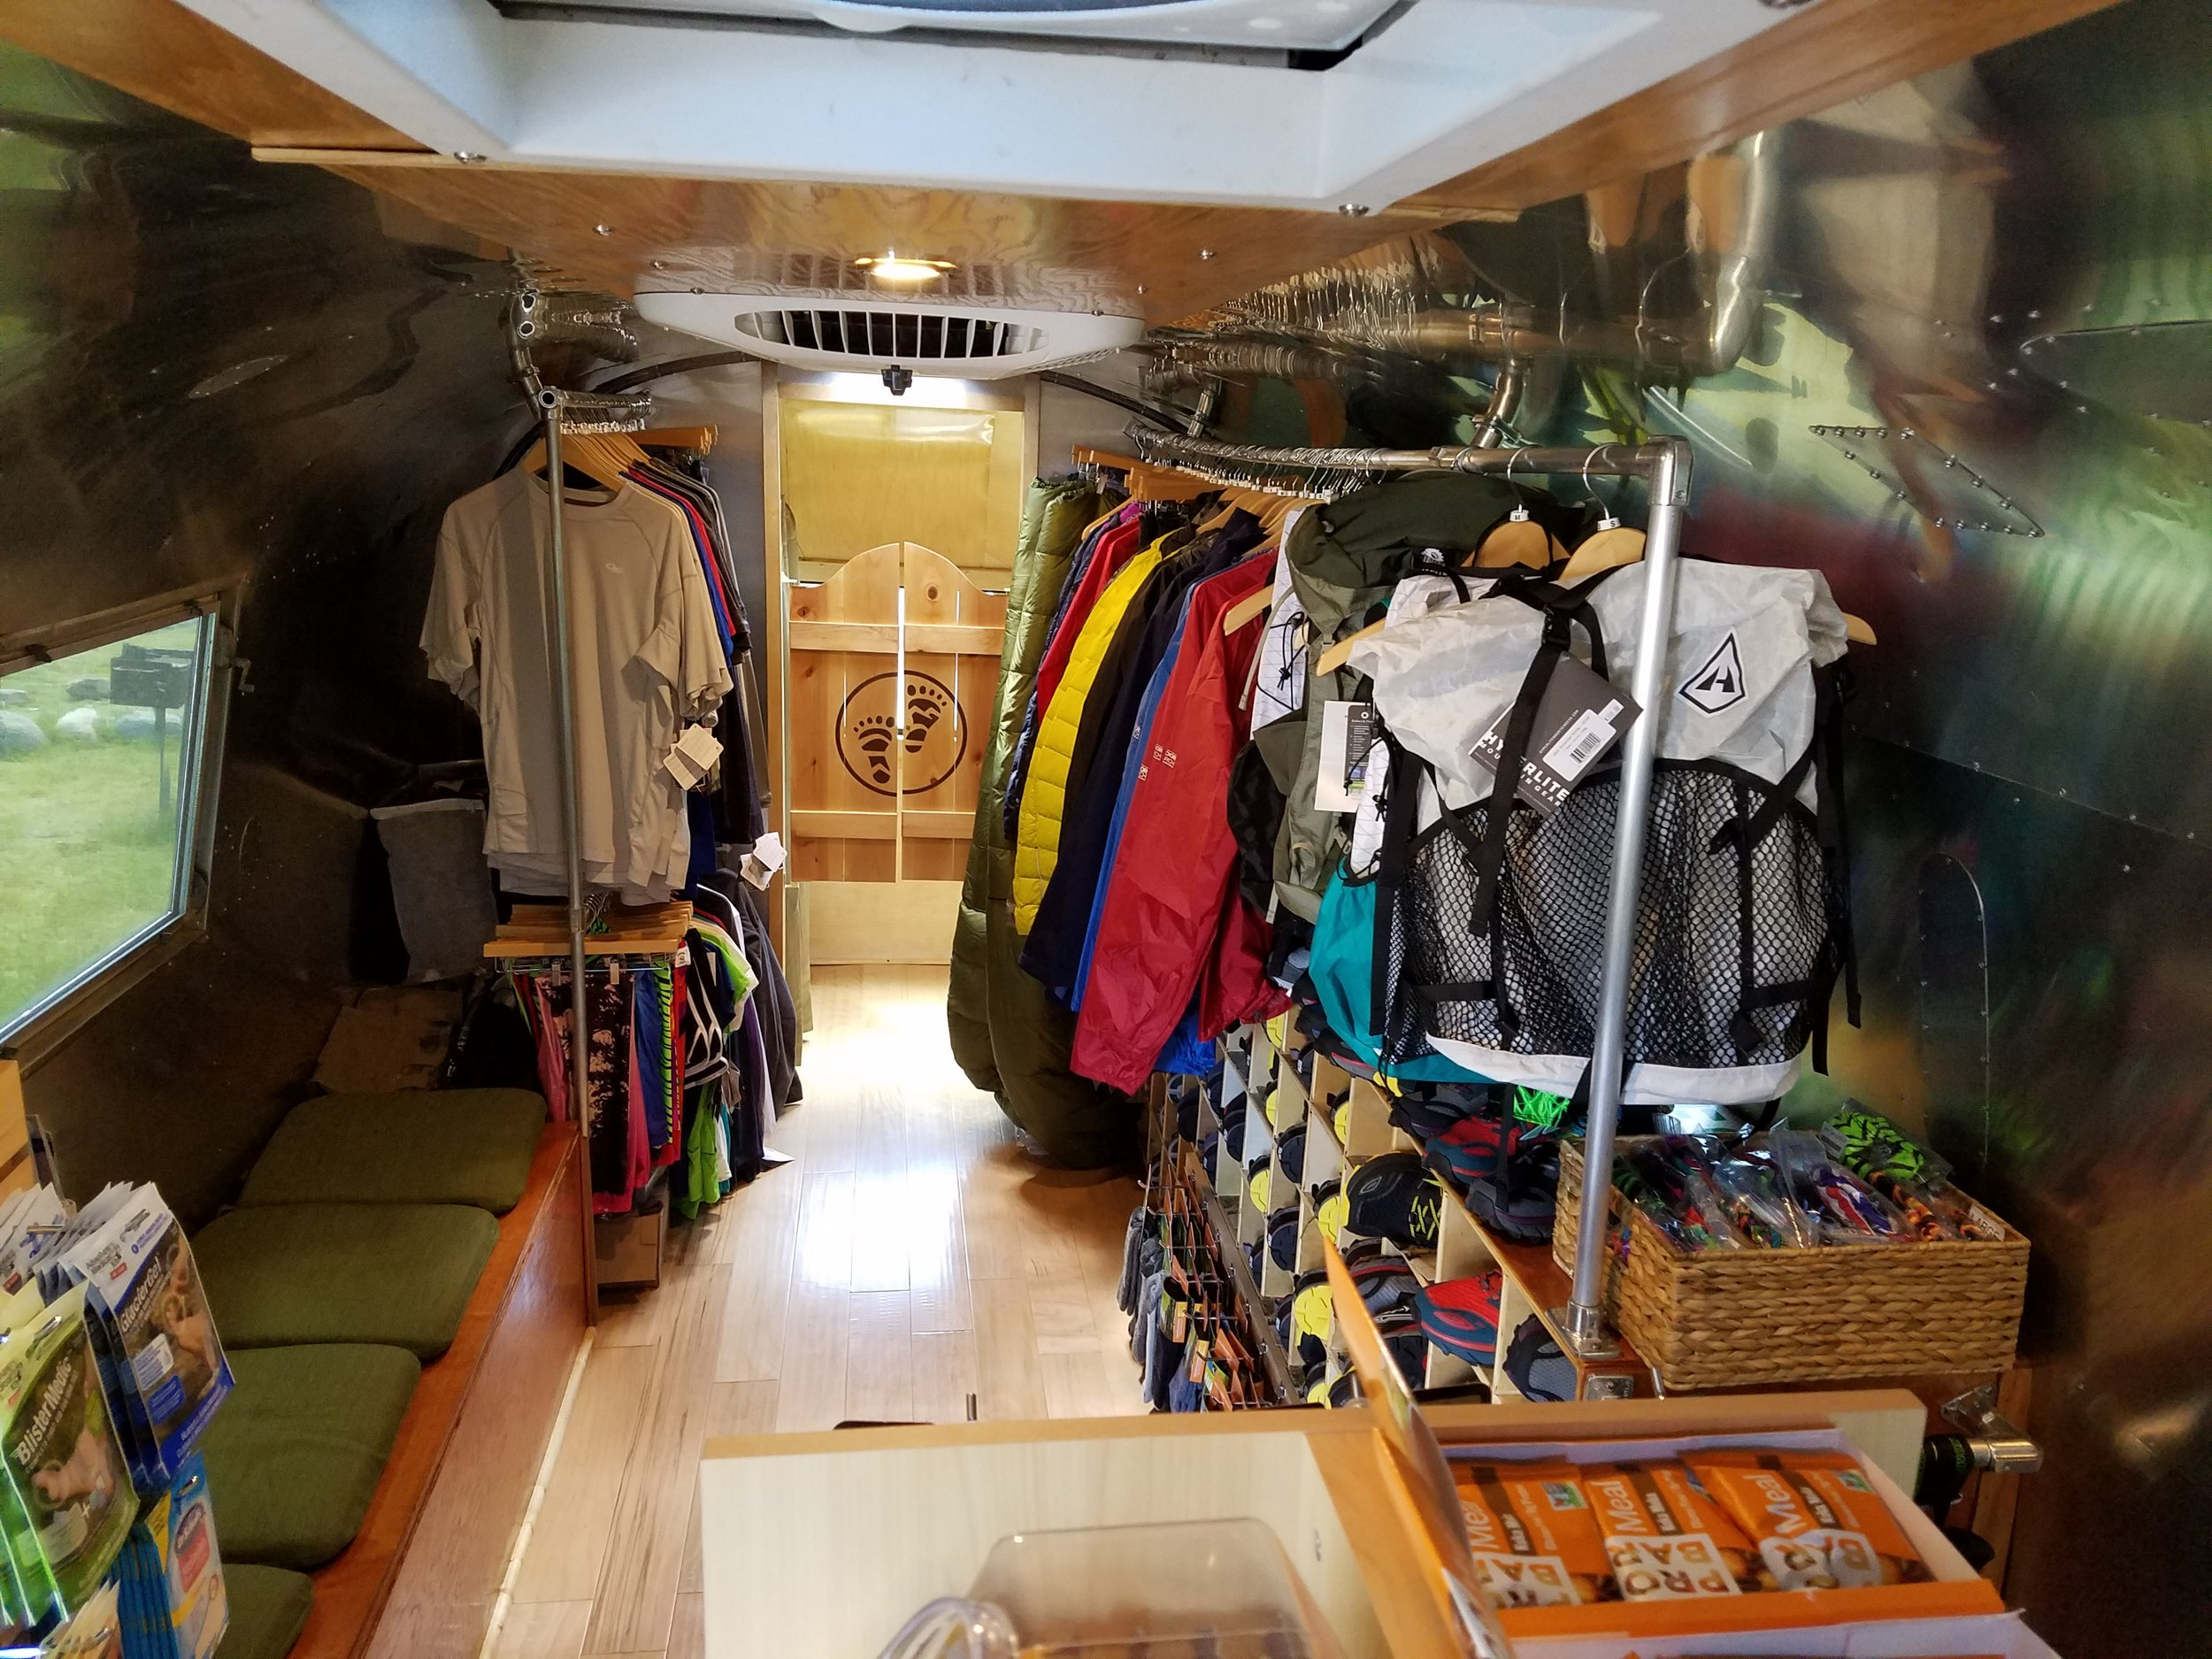 Inside the Airstream gear shop! Super cool setup